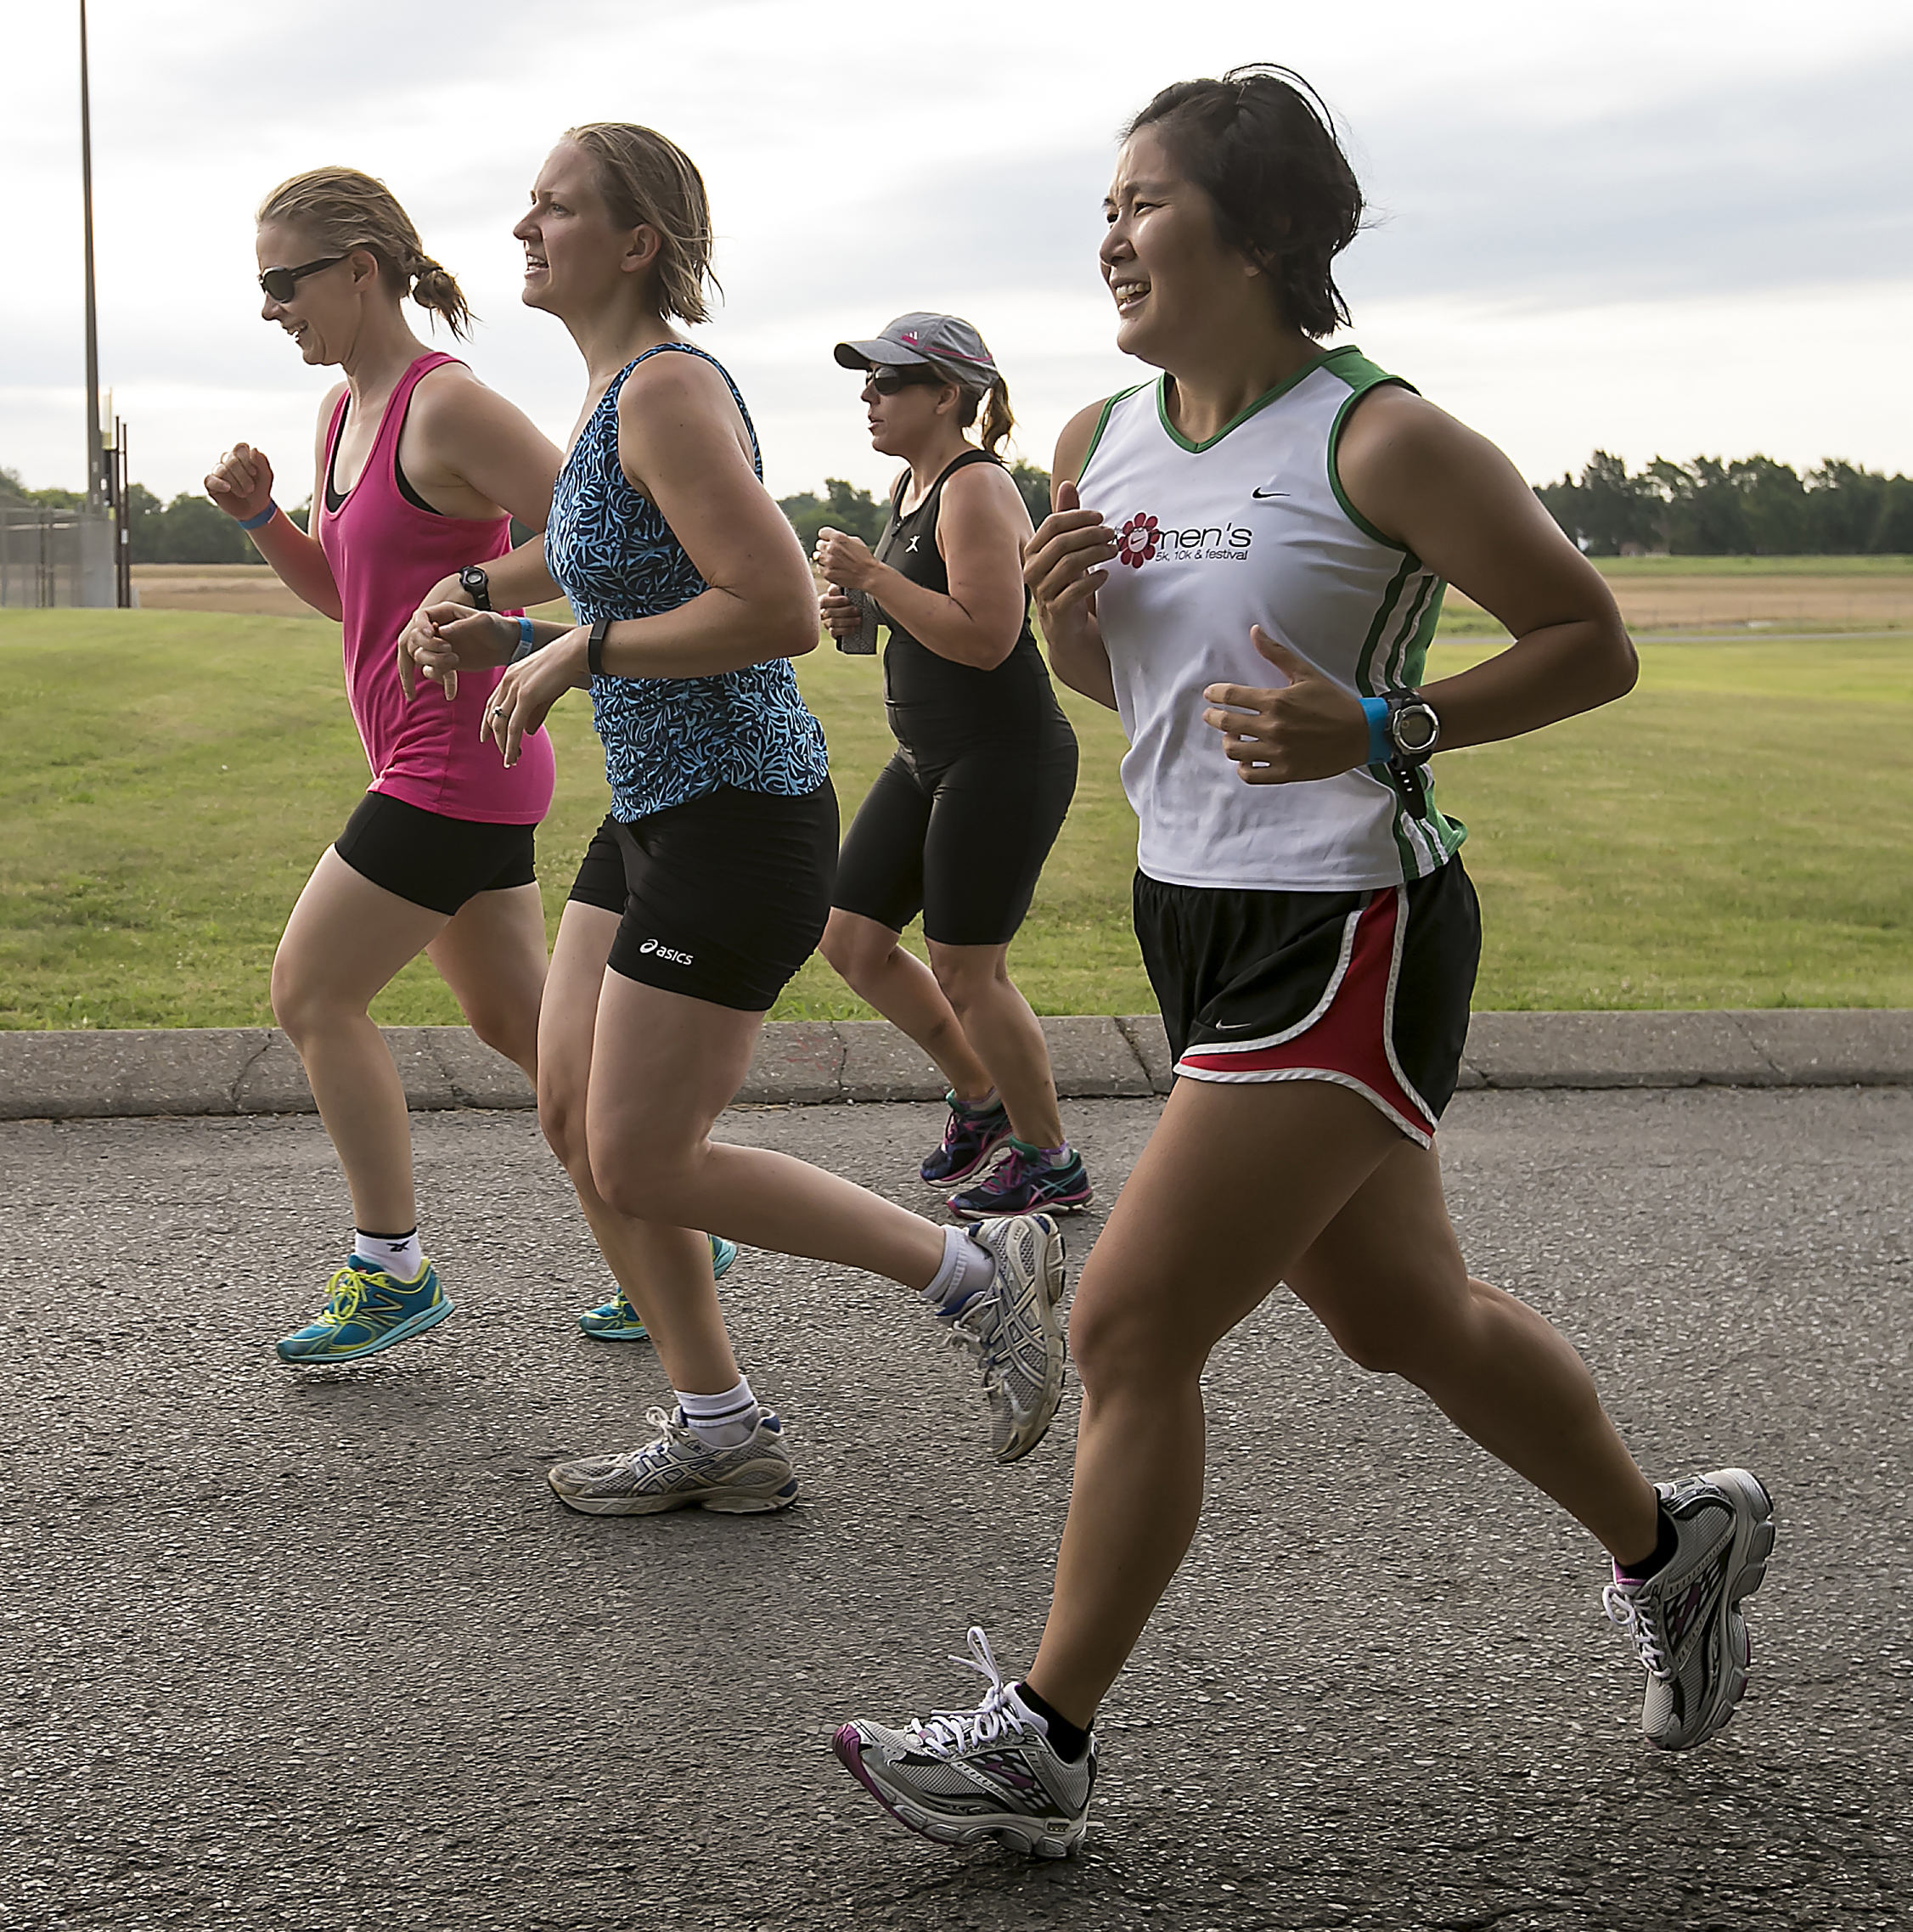 The Unofficial Triathlon in Murfreesboro